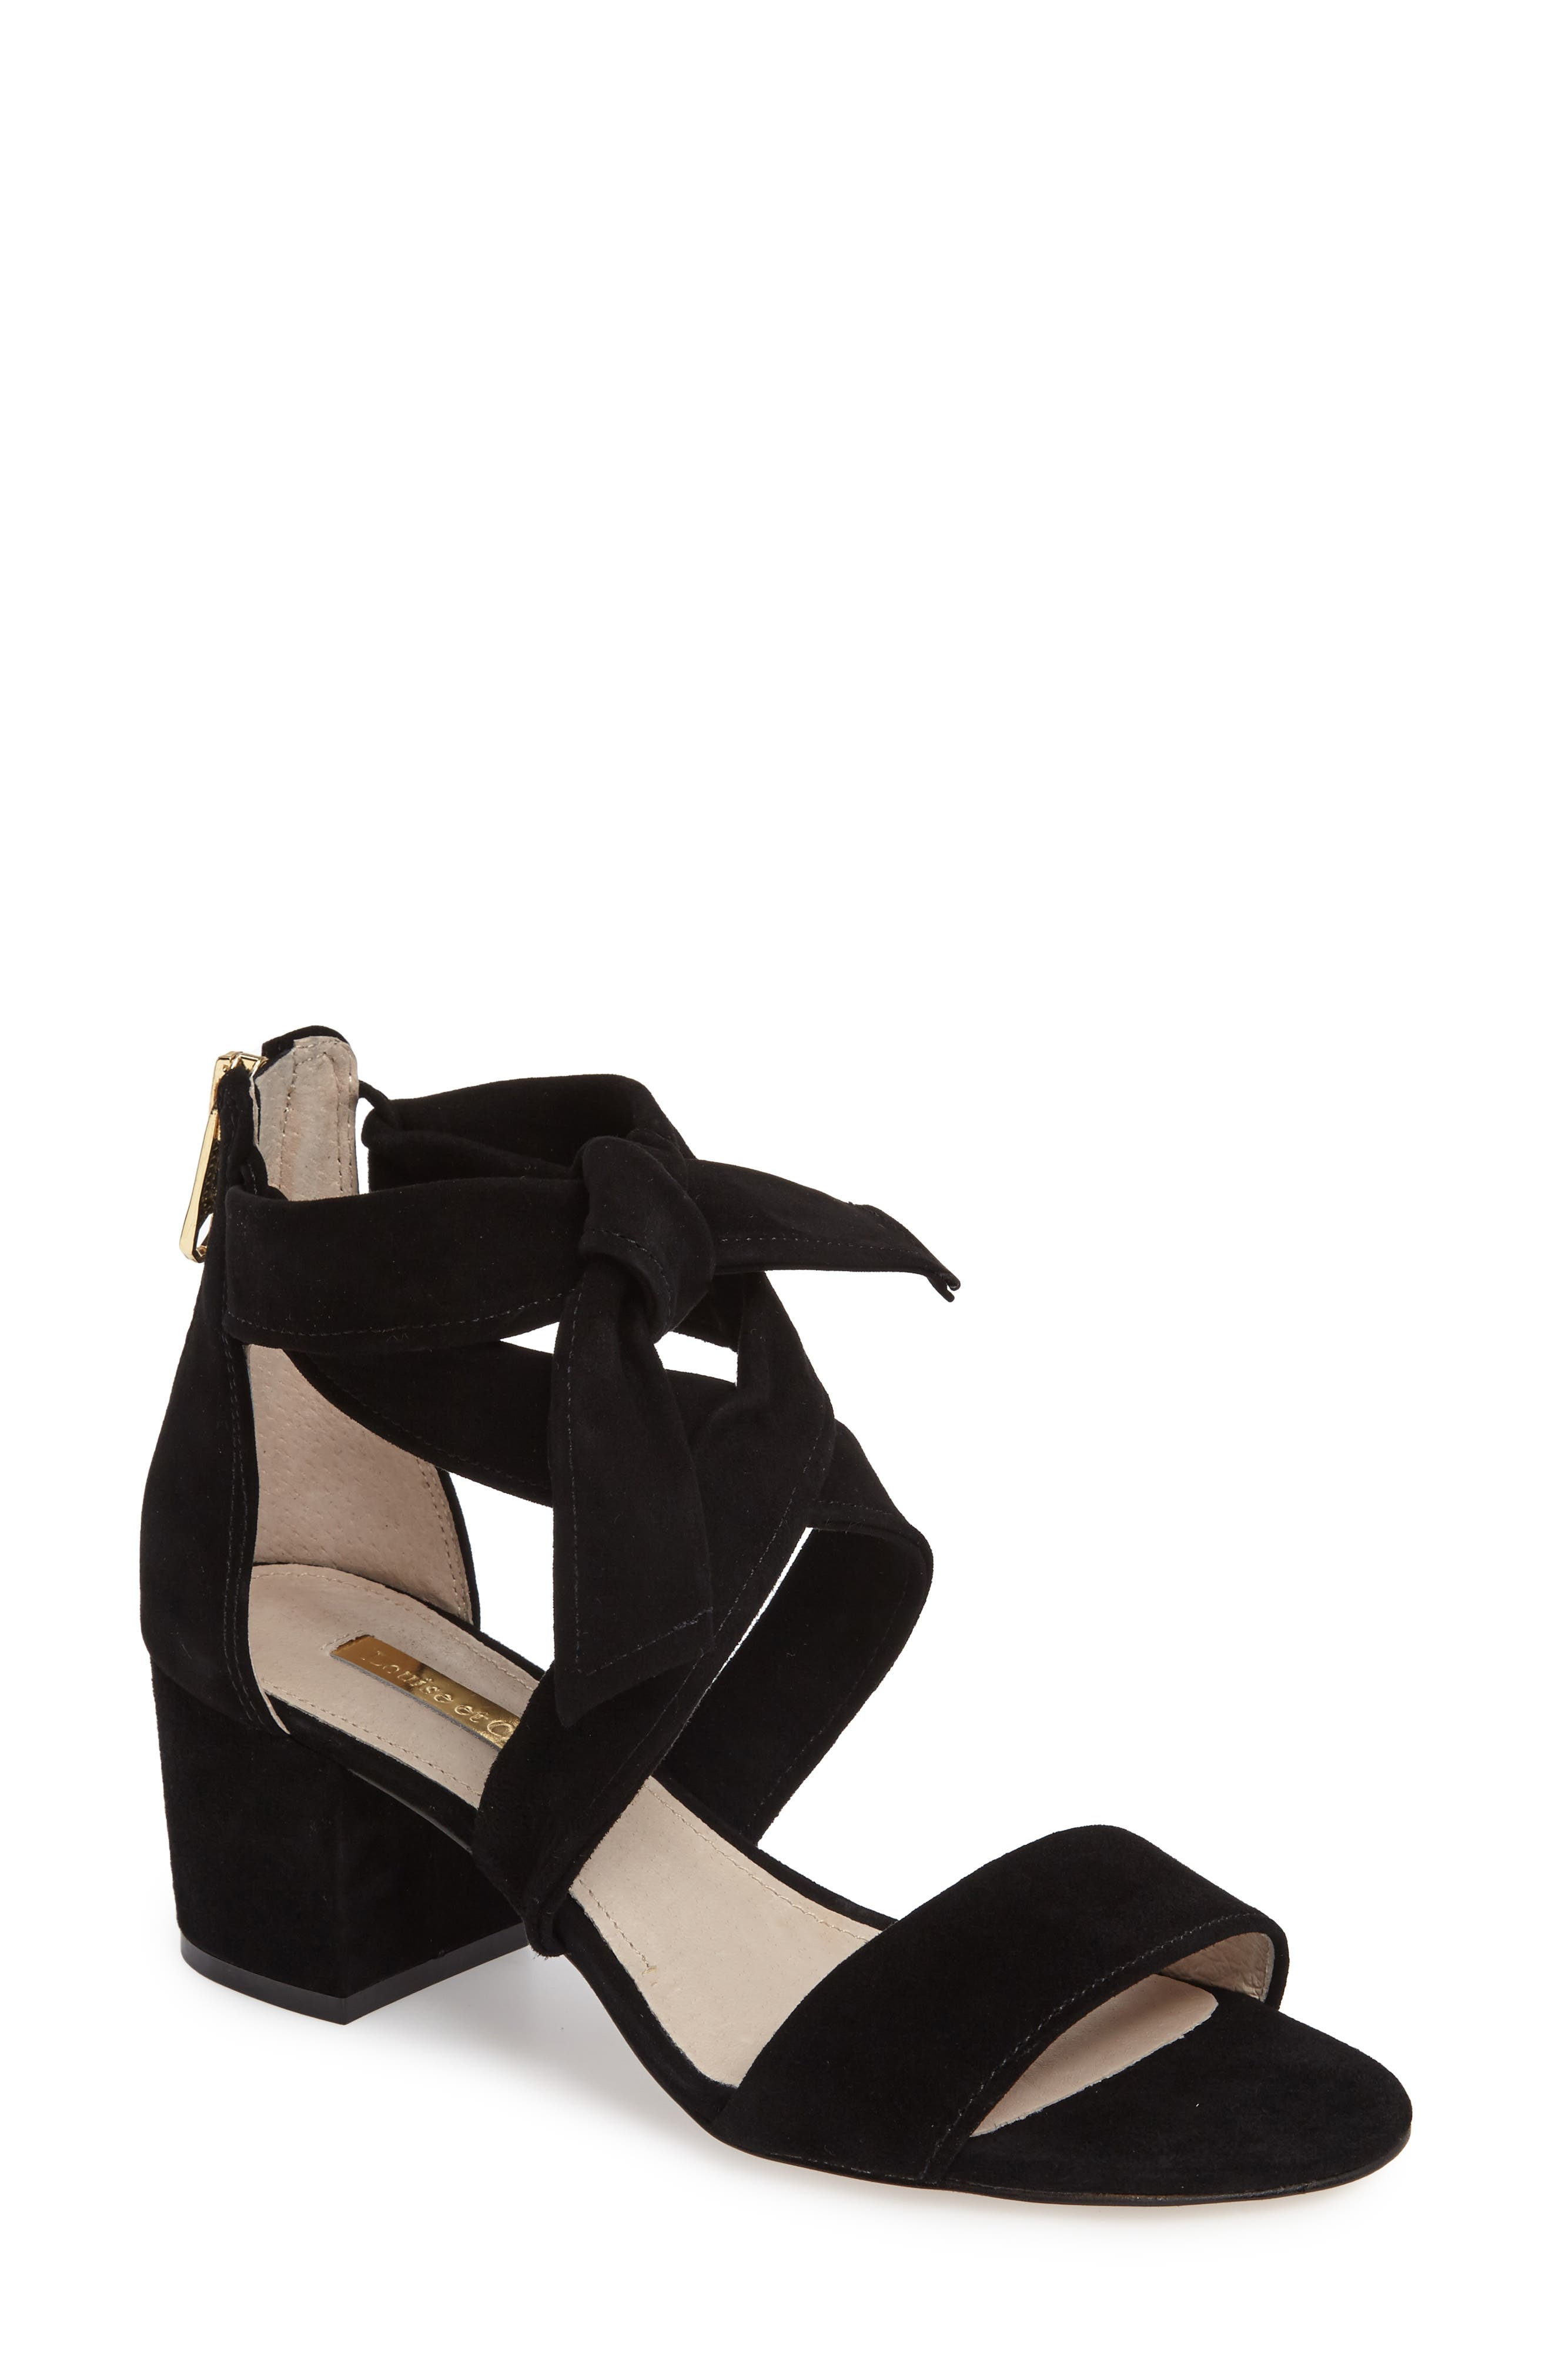 Alternate Image 1 Selected - Louise et Cie Gia Block Heel Sandal (Women)